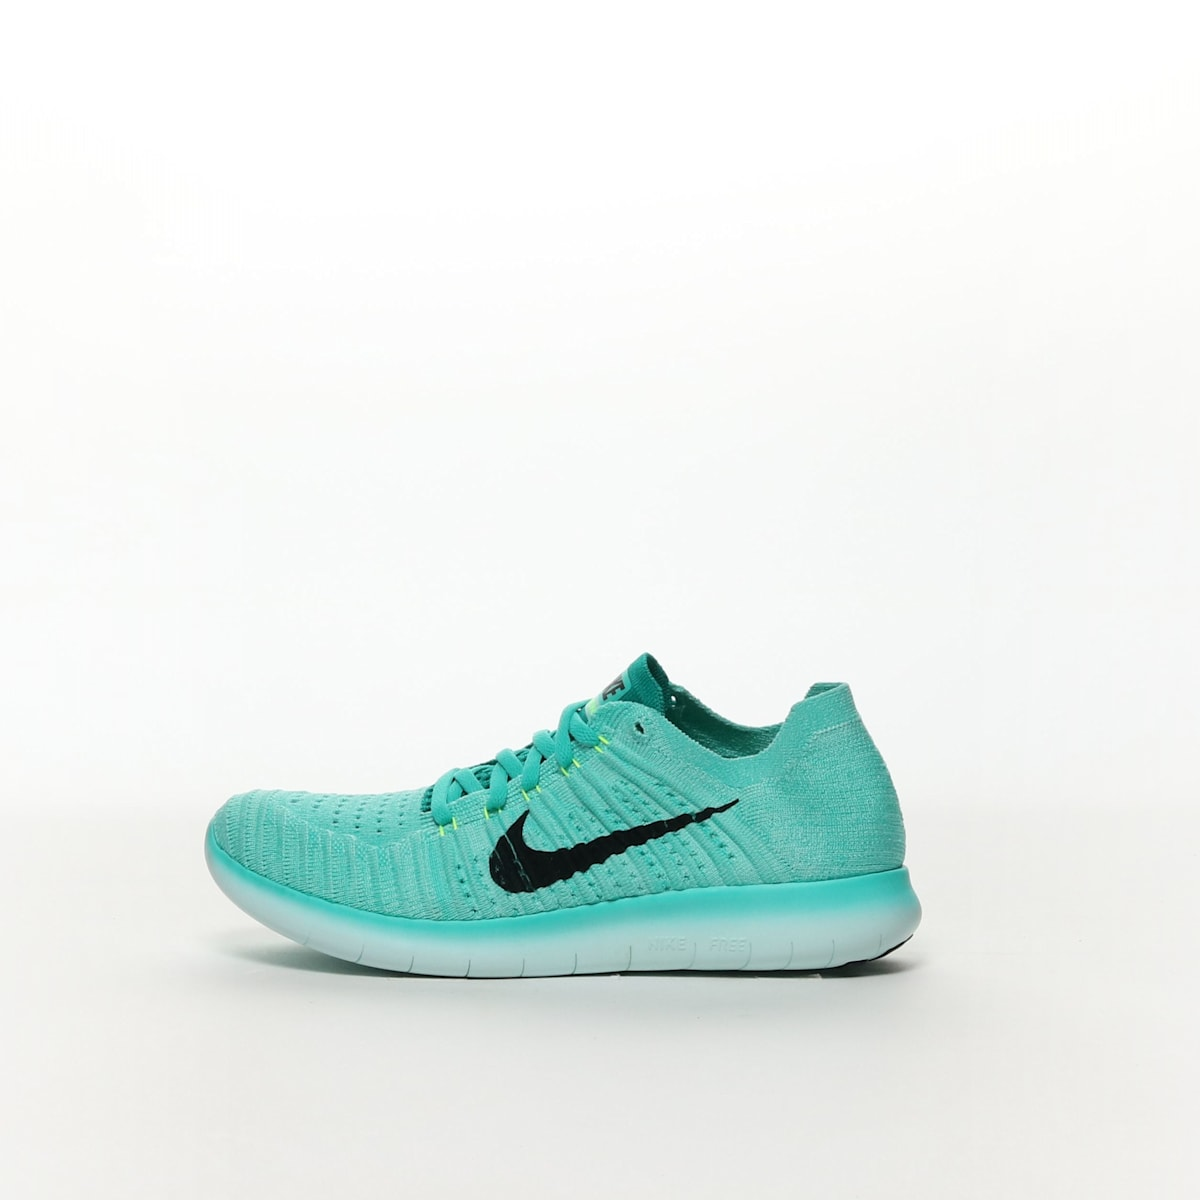 1d808715ad33 Women s Nike Free RN Flyknit Running Shoe - HYPER TURQ BLACK-VOLT ...